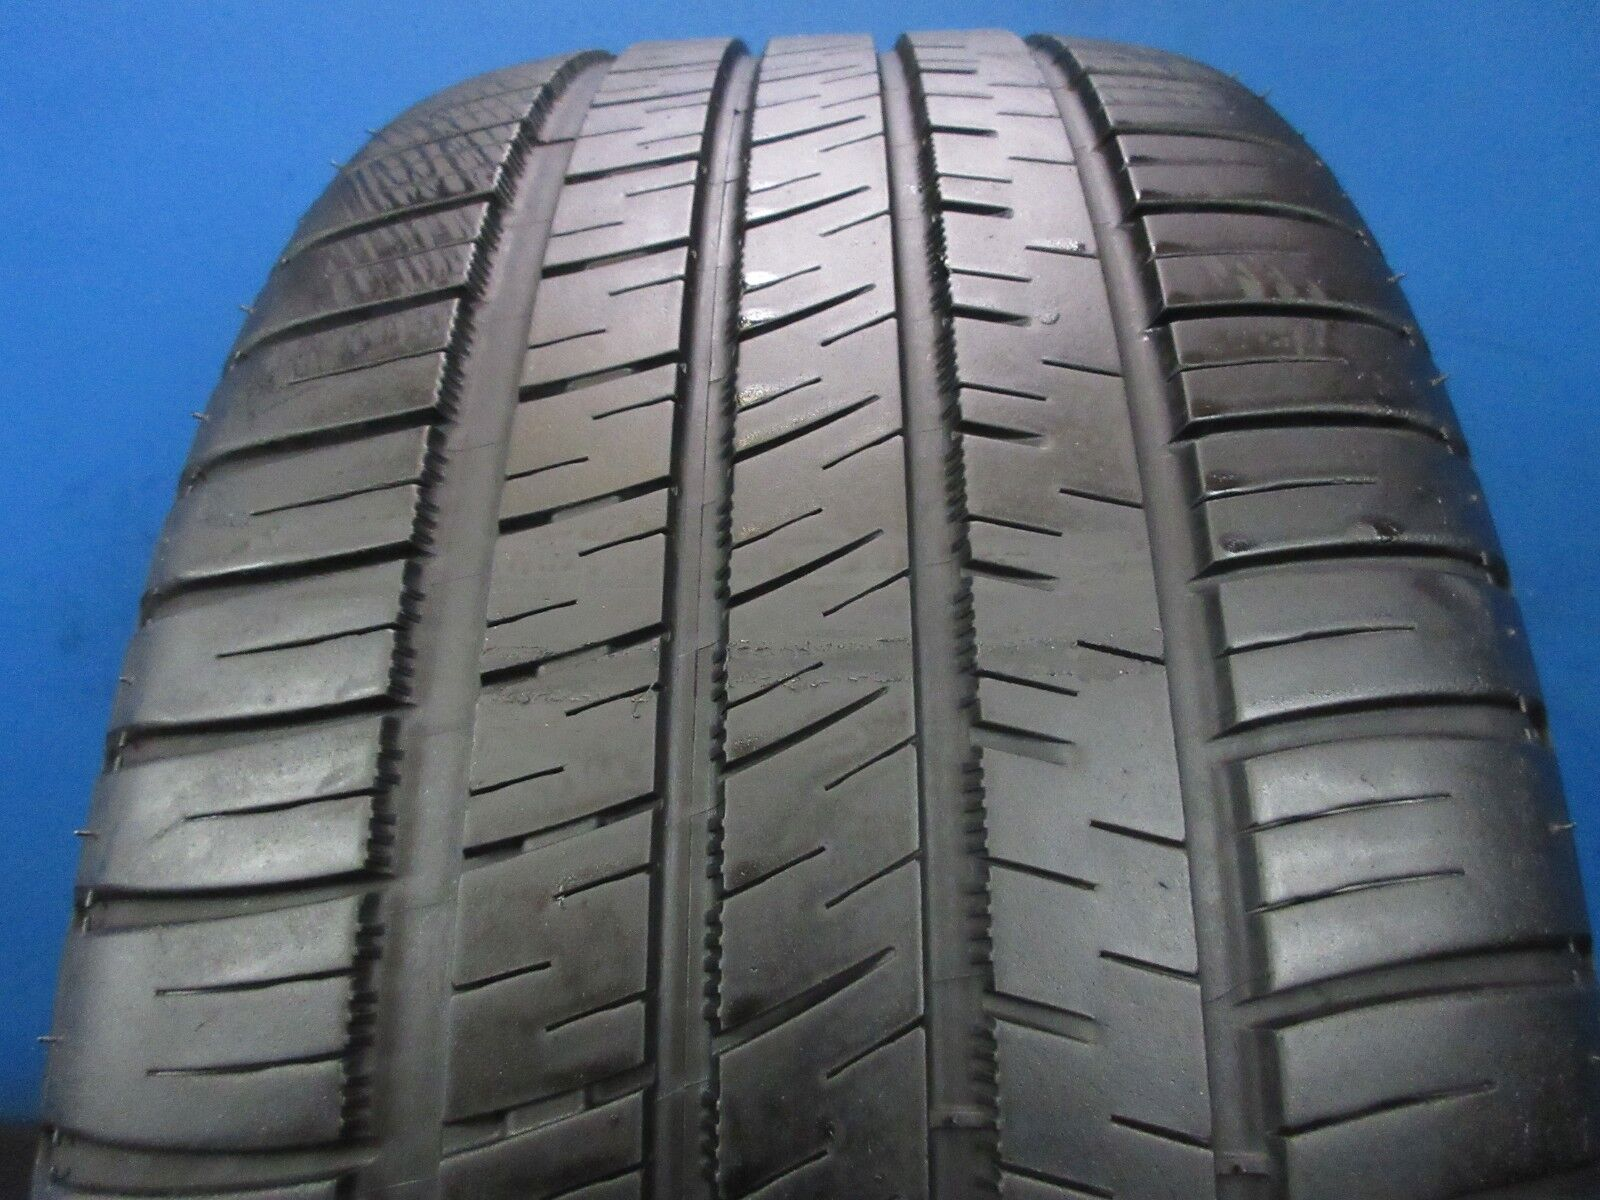 Used Michelin Pilot Sport A/S 3+  245 45ZR 17  6-7/32 Tread No Patch 1516C